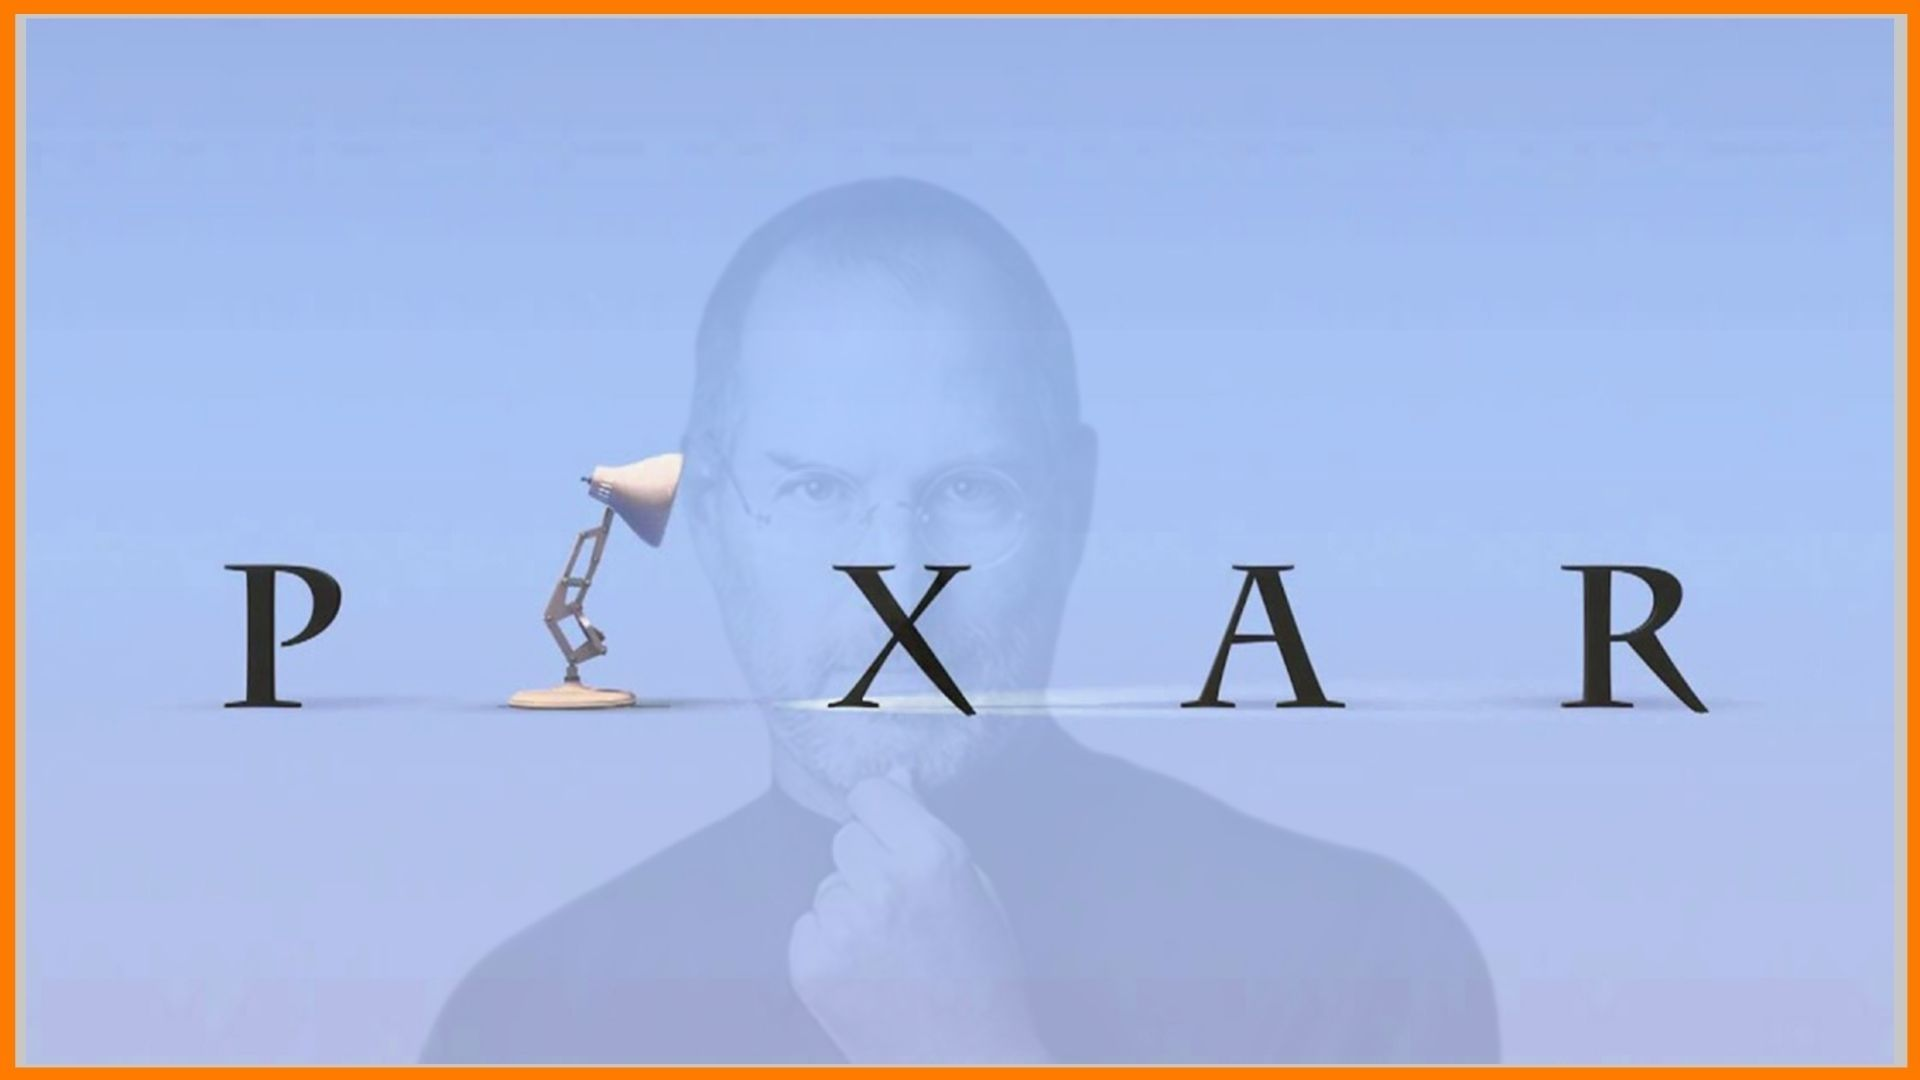 Steve jobs Bought Pixar in 1986.